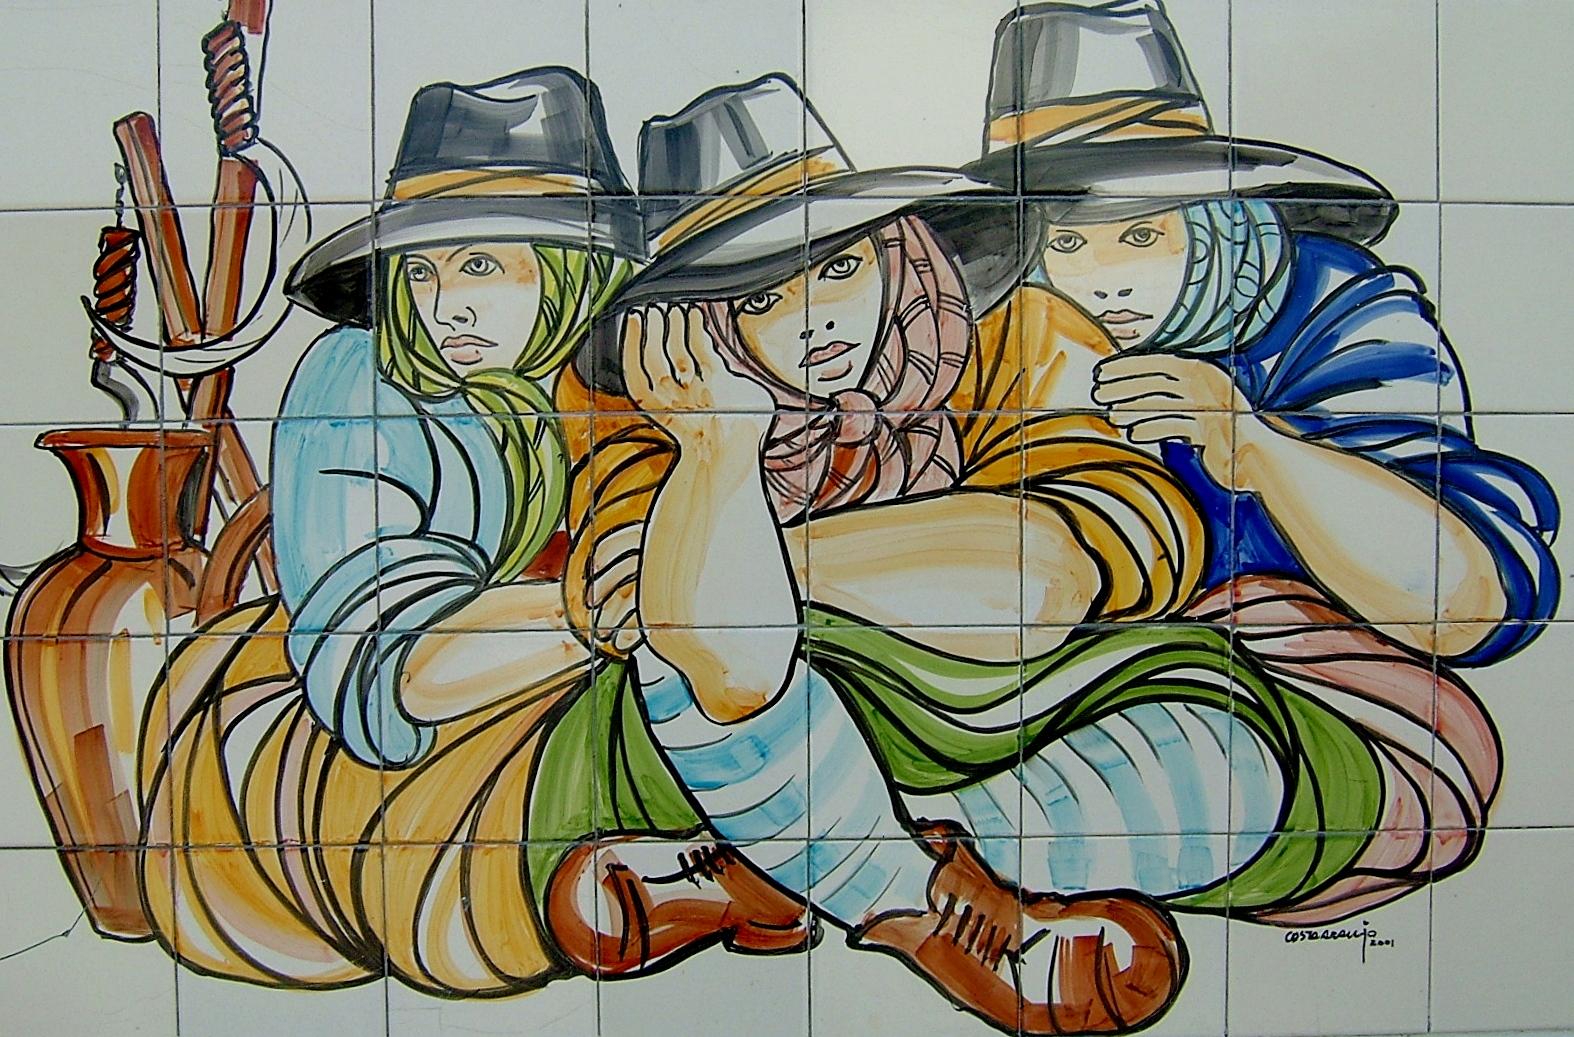 Costa araujo tr s ceifeiras pintura em azulejo painel - Pintura de azulejos ...